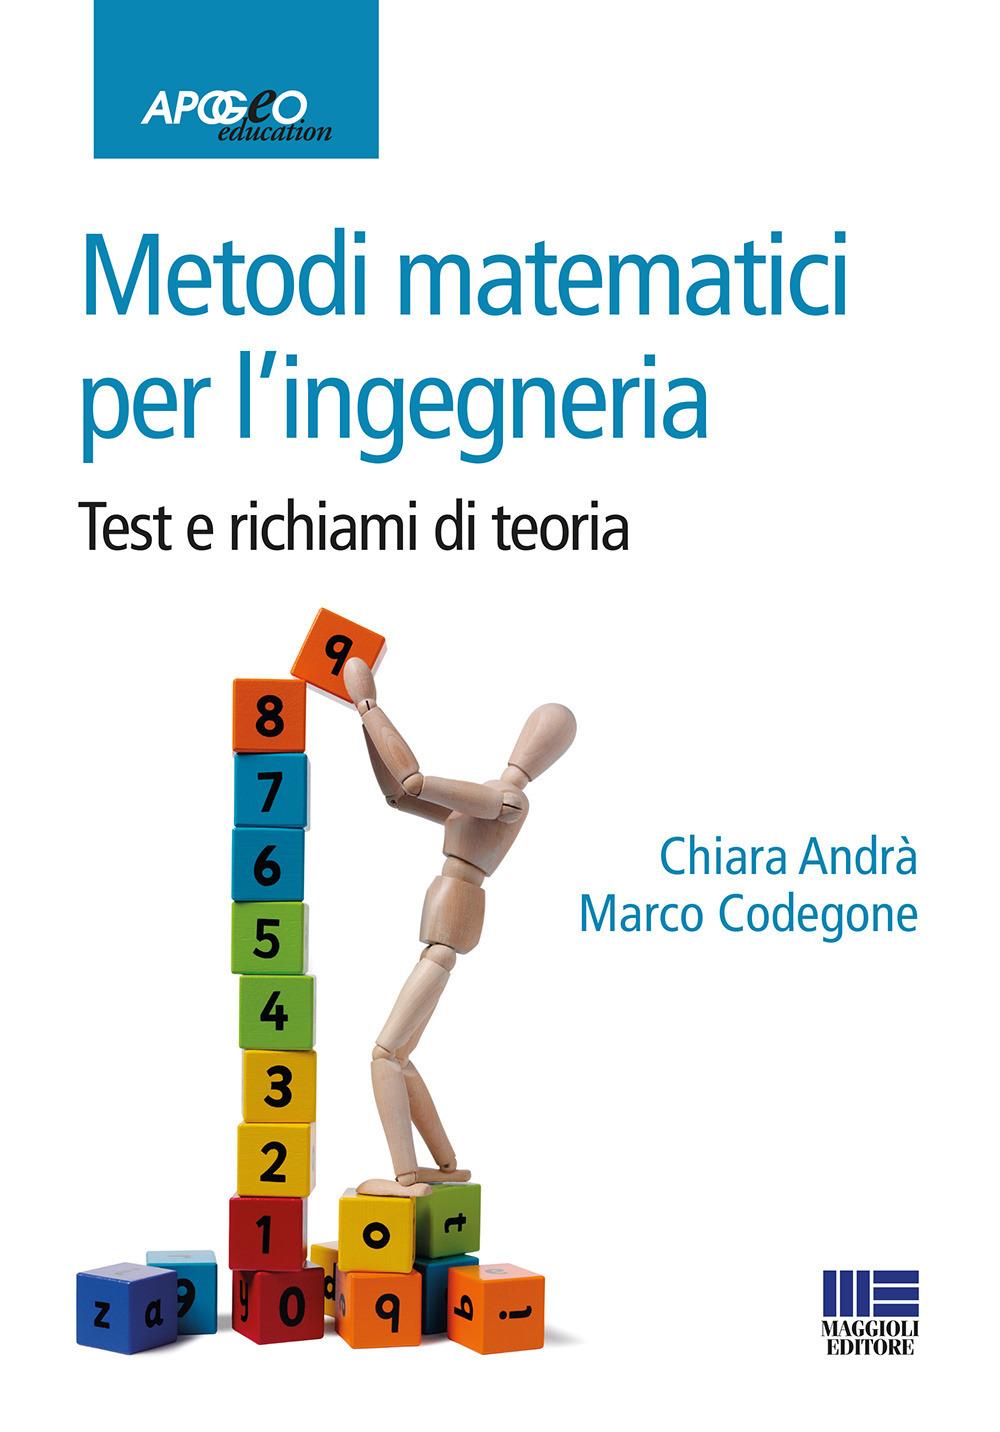 Image of Metodi matematici per l'ingegneria. Test e richiami di teoria